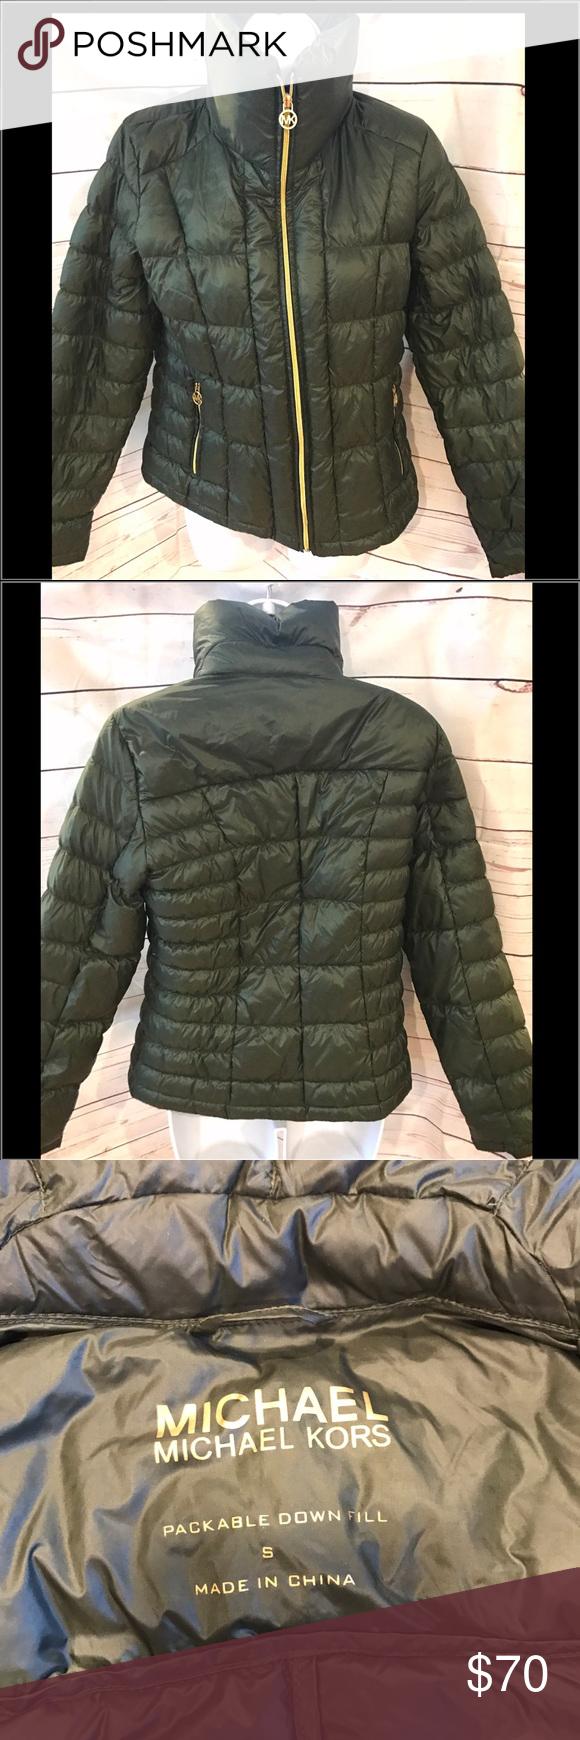 b6175be26 Michael Kors olive down jacket Michael Kors olive down jacket ...